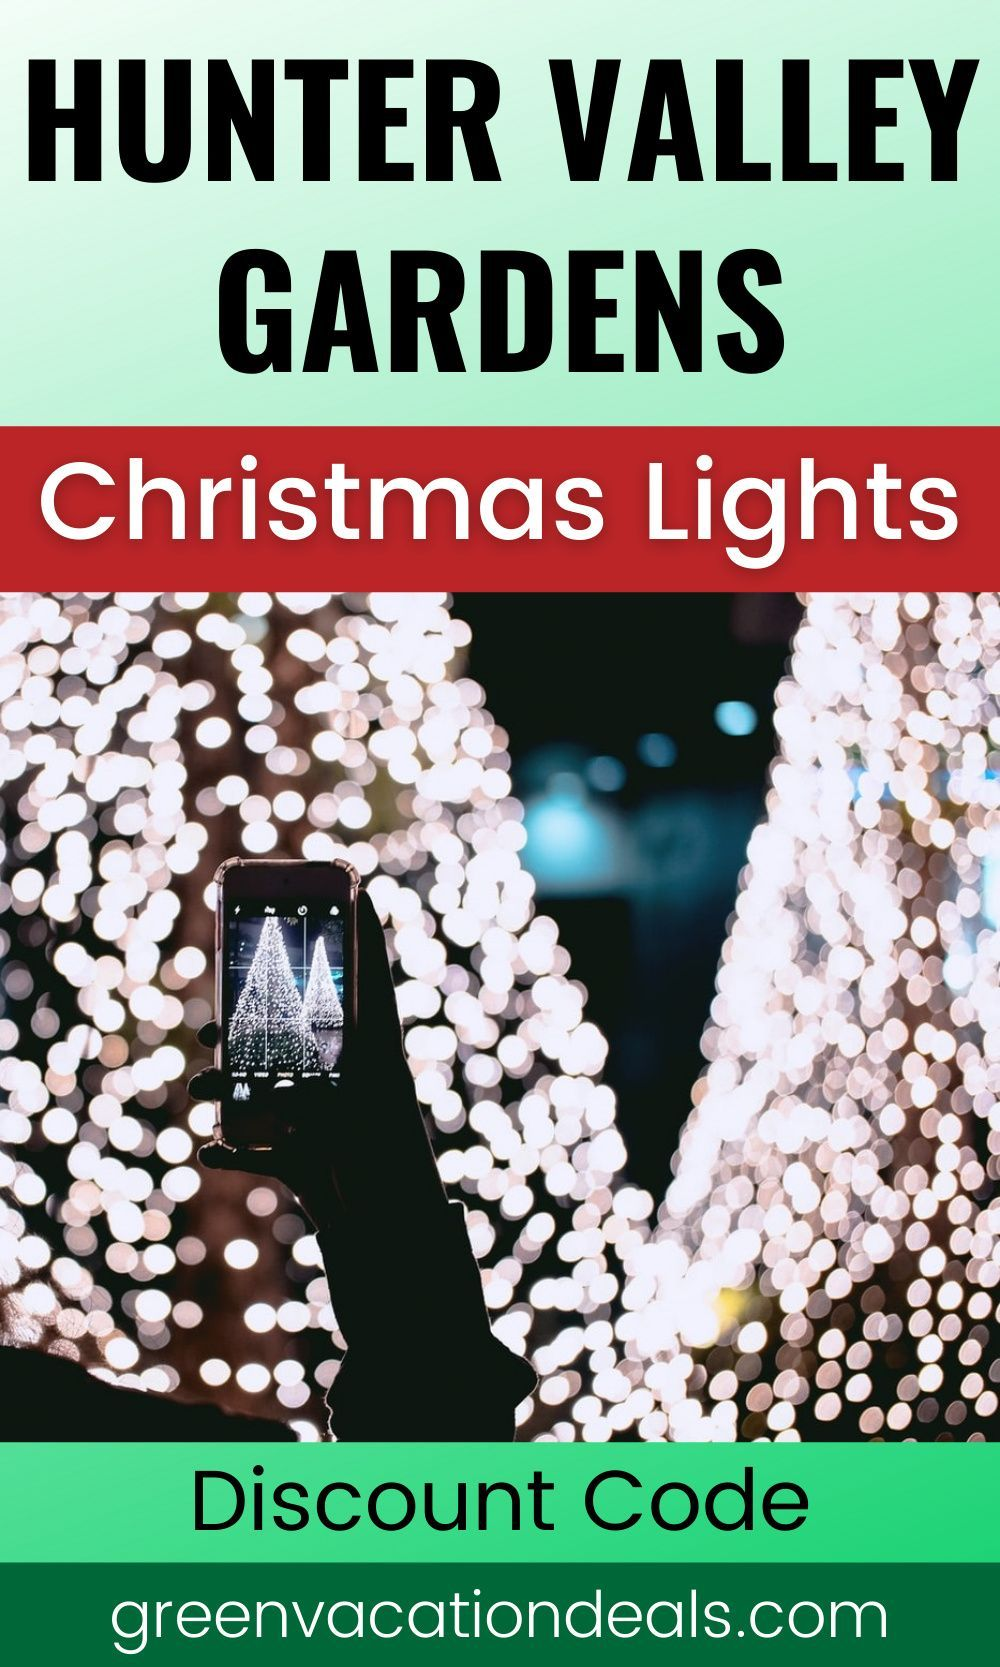 ed669ec434287570be4d2308762251bc - Hunter Valley Gardens Christmas Lights Discount Code